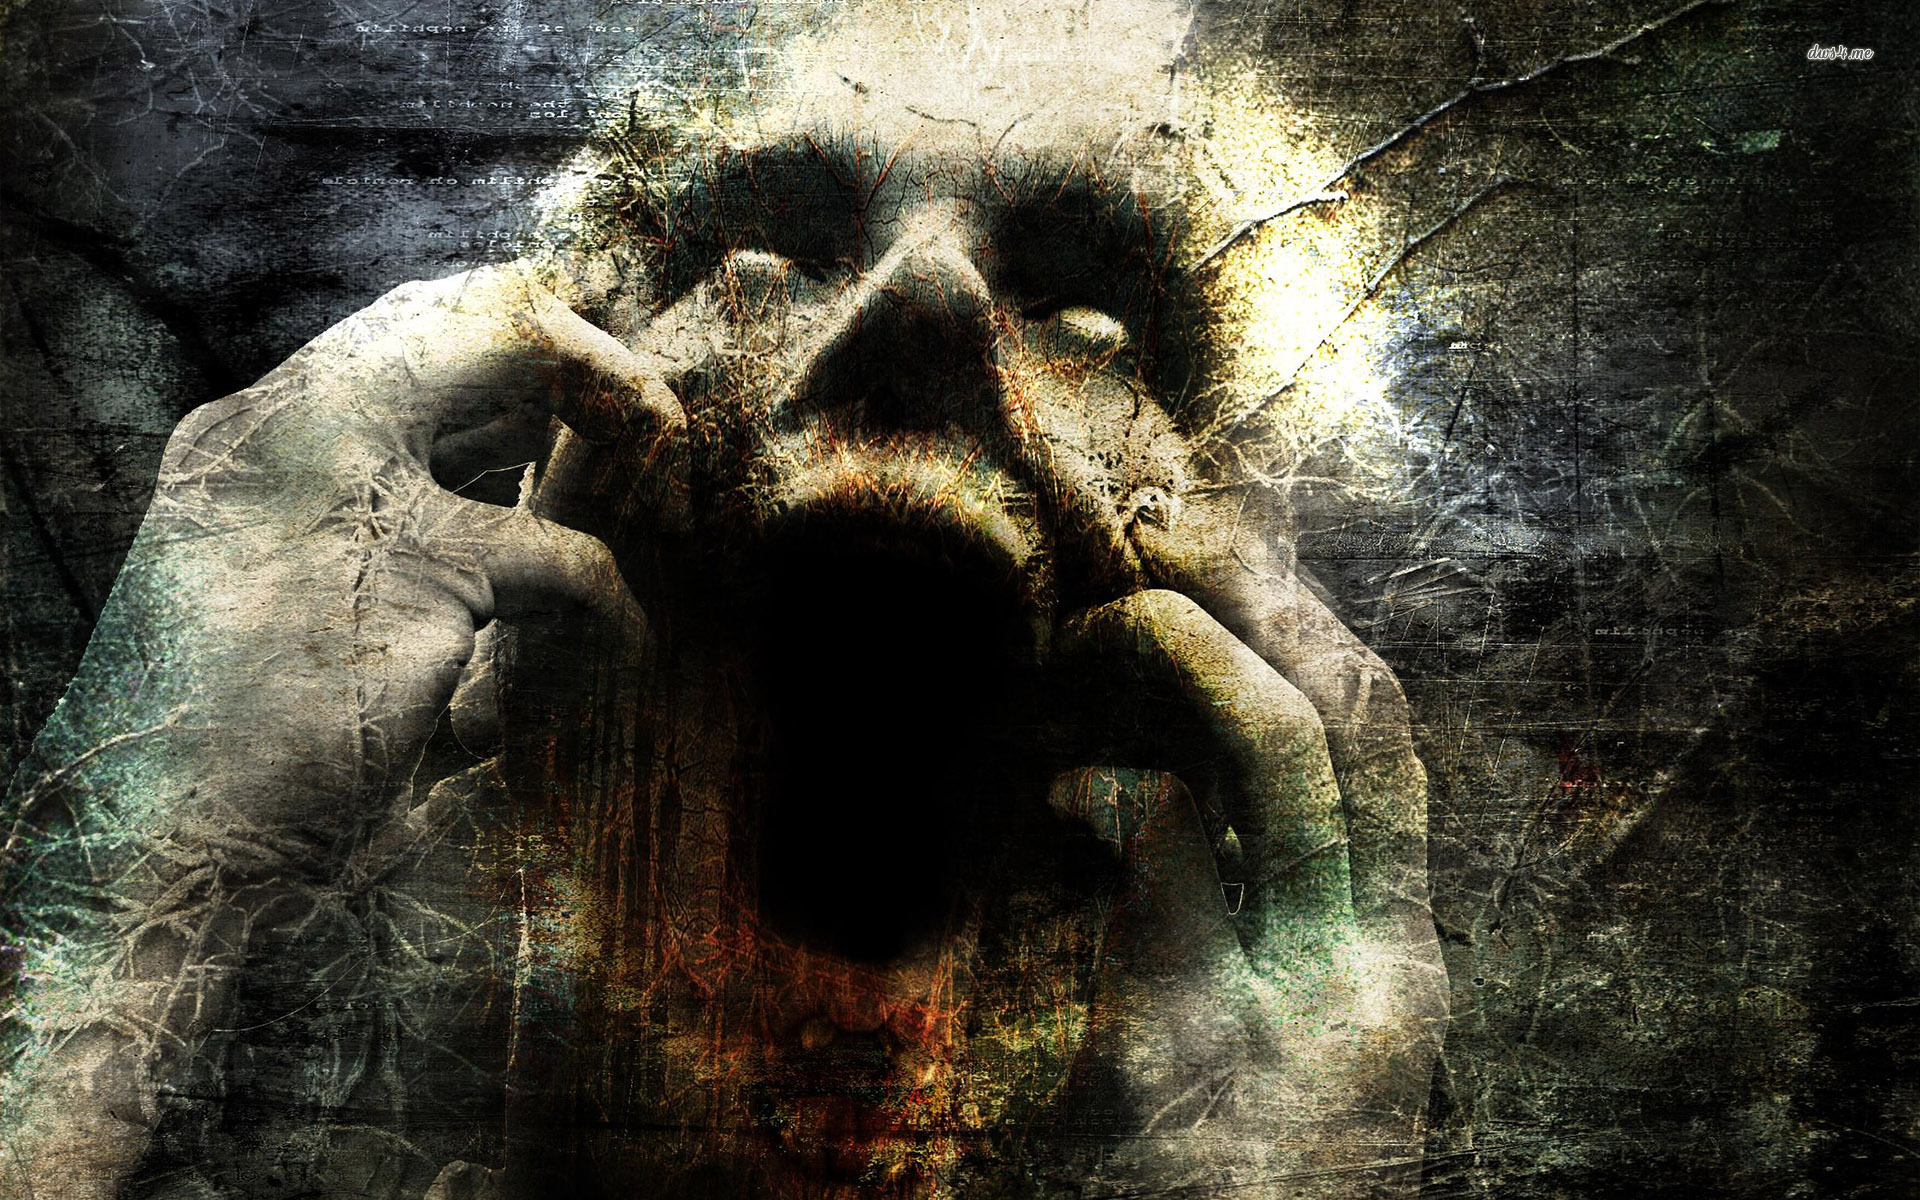 Hd wallpaper horror - Hd Wallpaper Horror